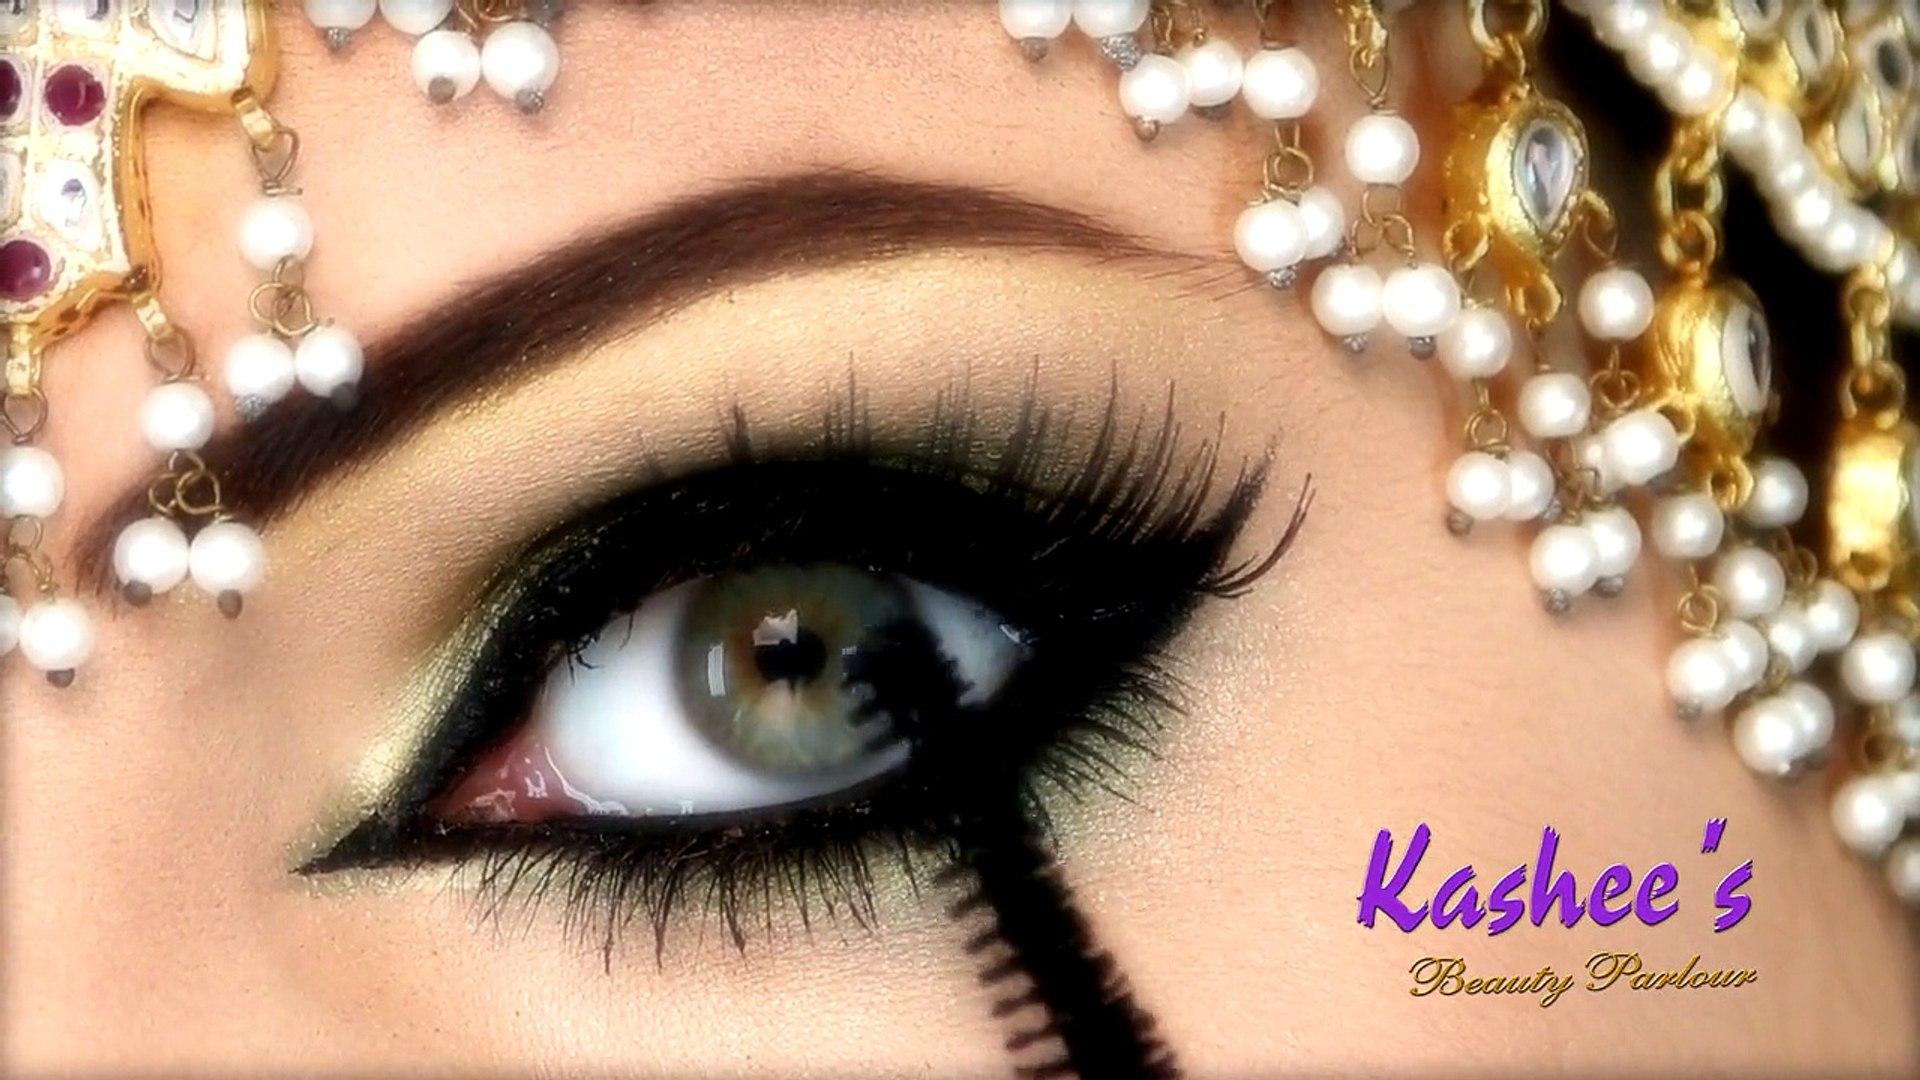 beautiful eye makeup by kashee..